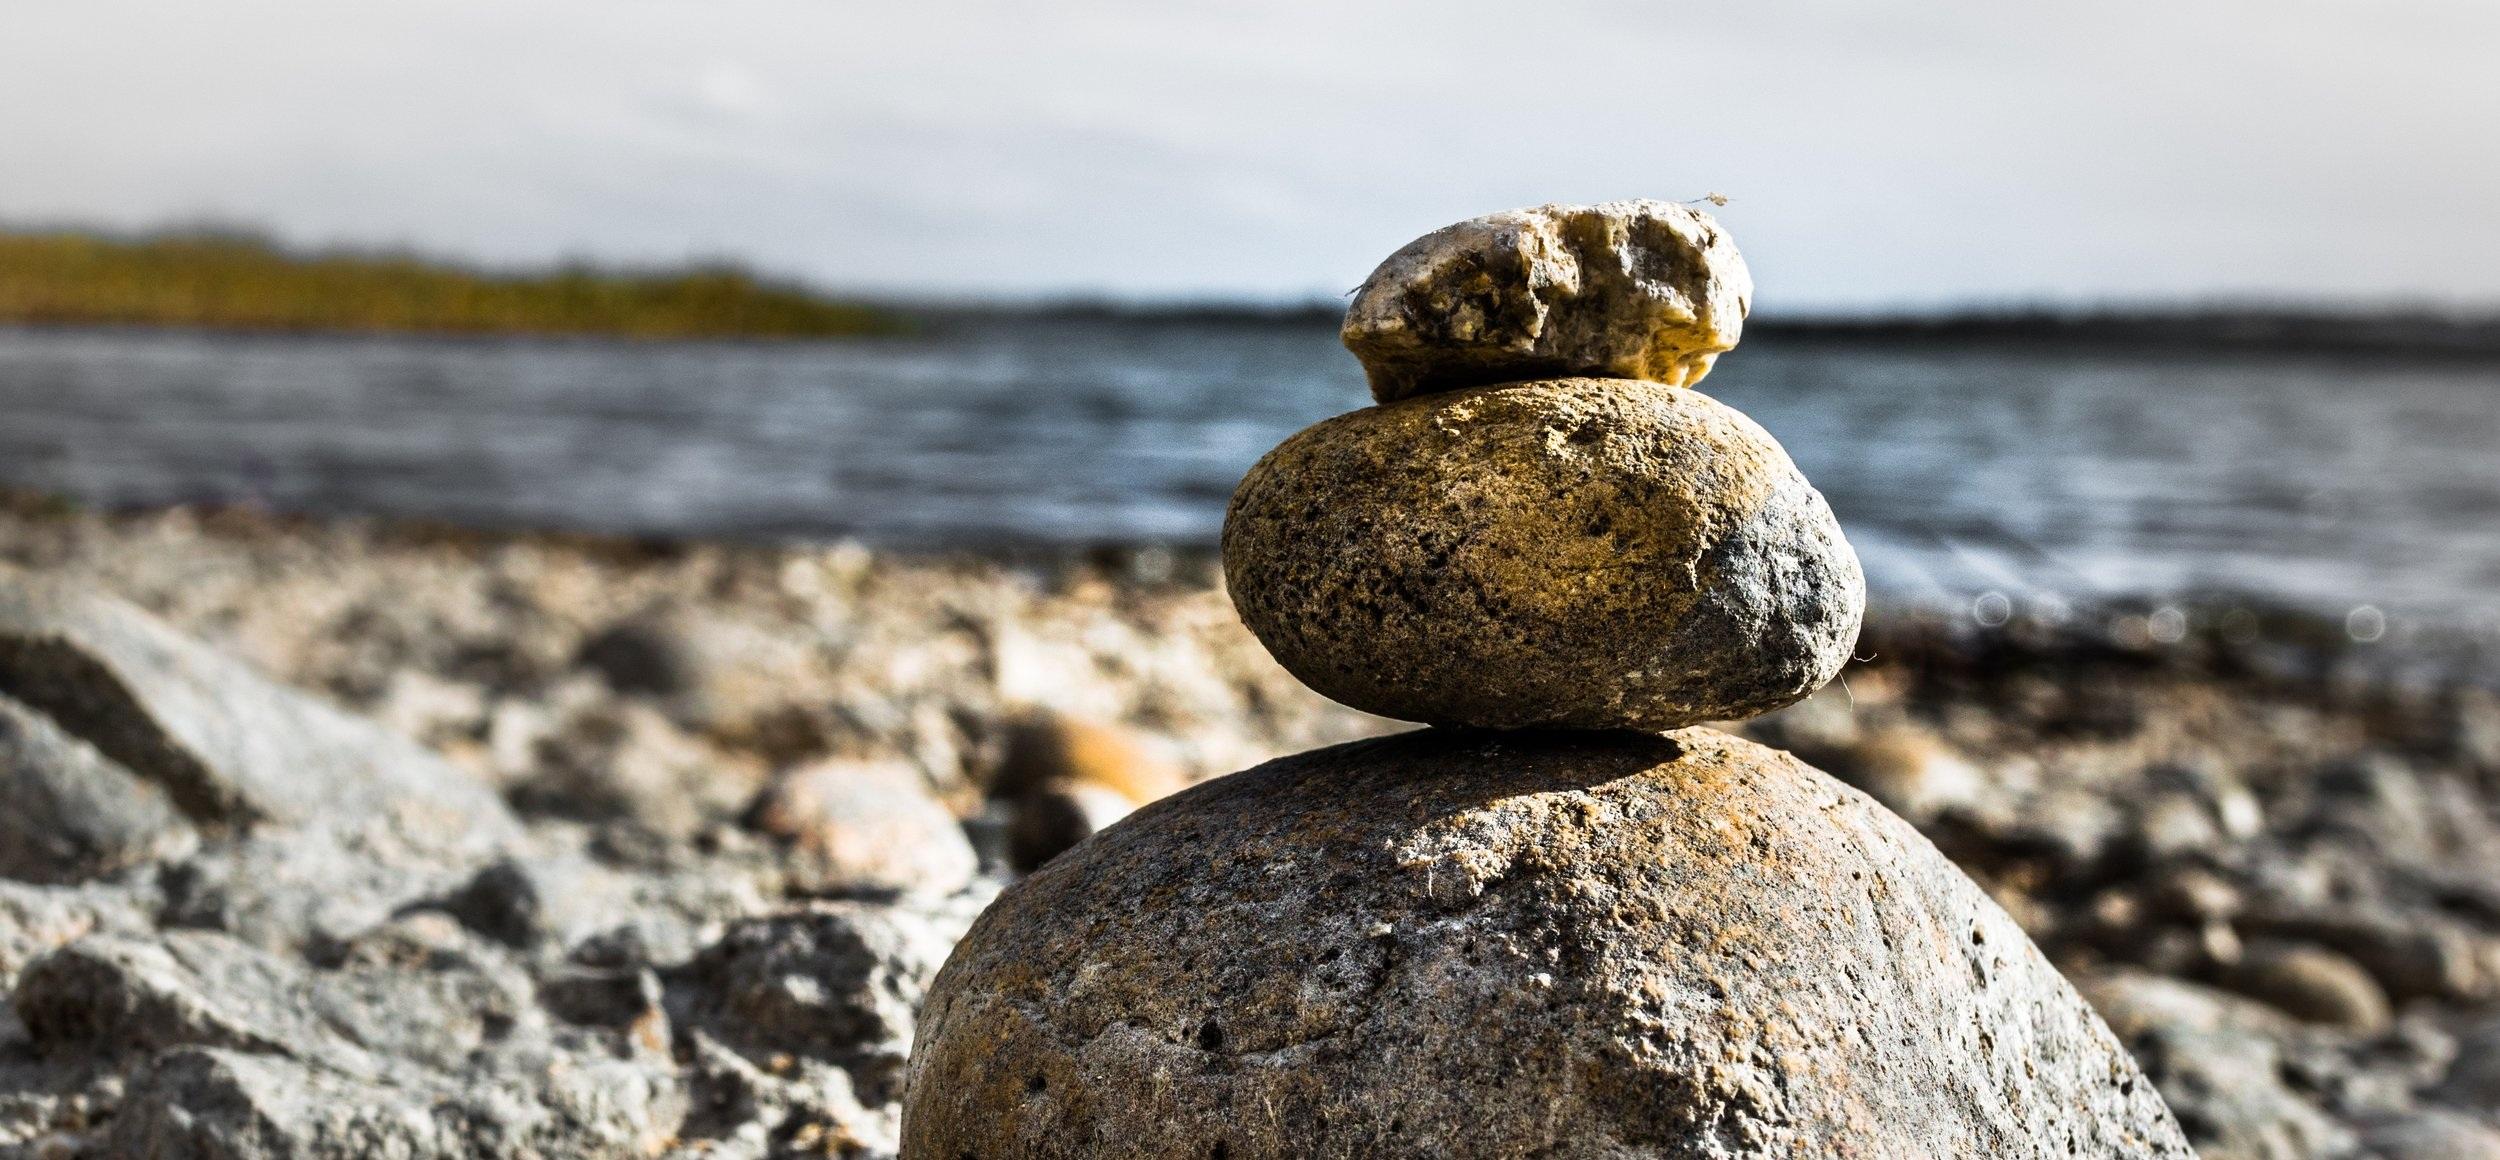 balance-boulders-close-up-907911.jpg